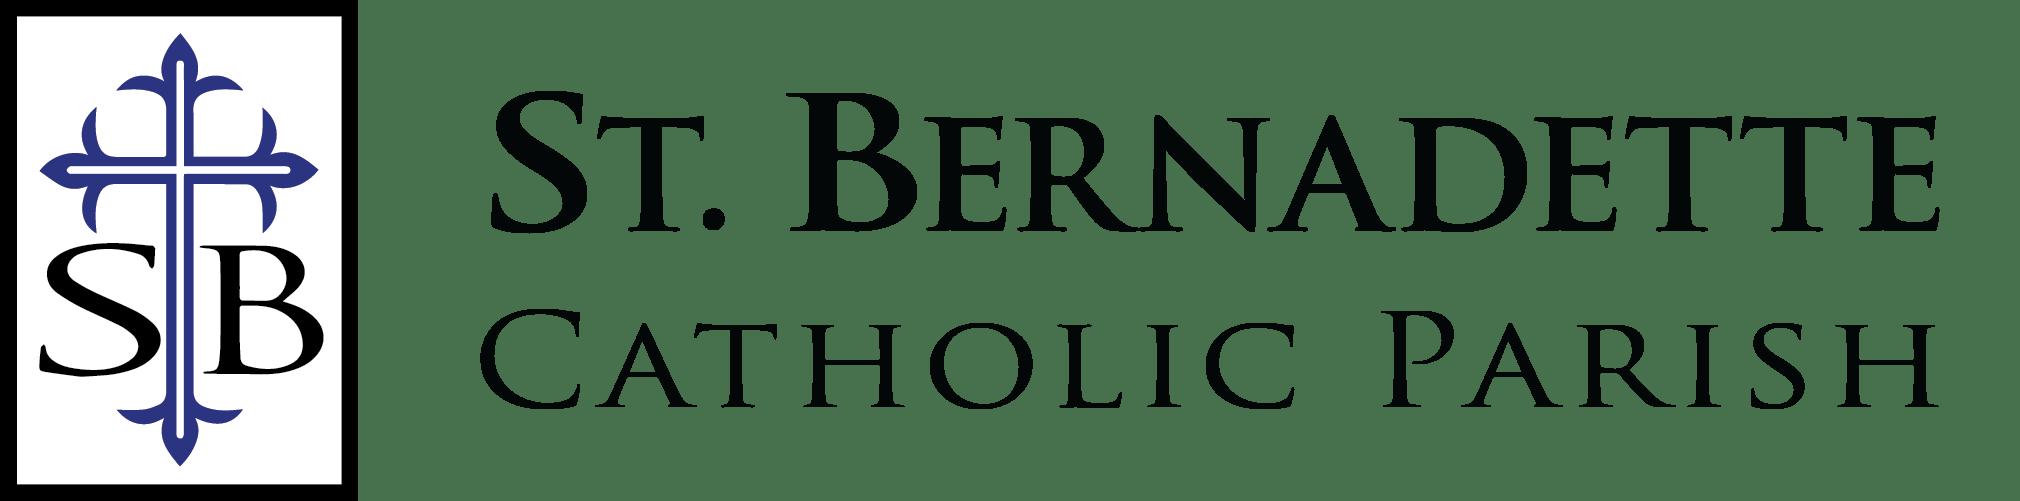 St. Bernadette Catholic Parish Lakewood Colorado